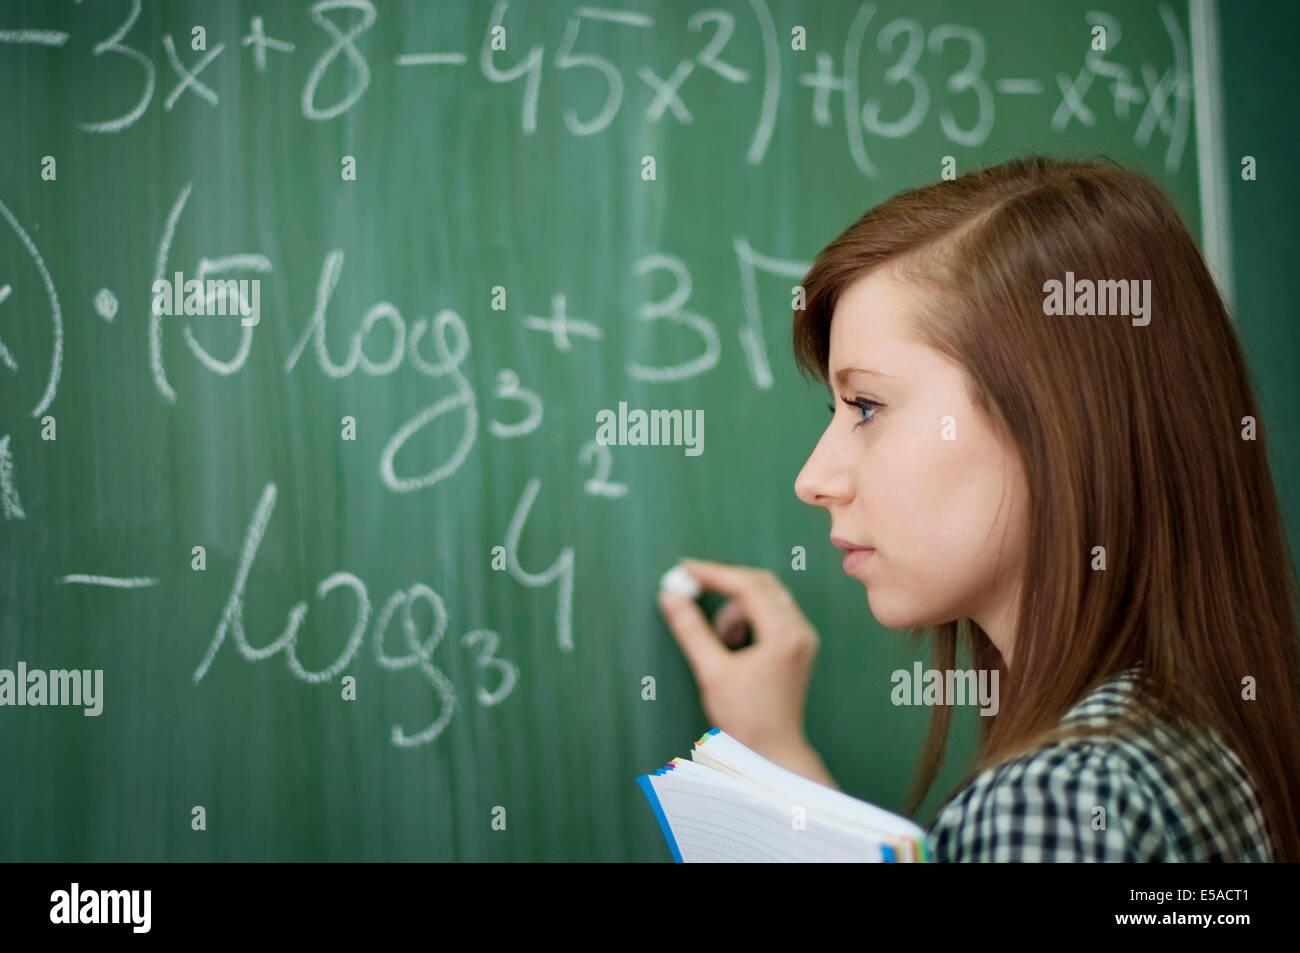 Student girl writing mathematical formula, Debica, Poland. Stock Photo